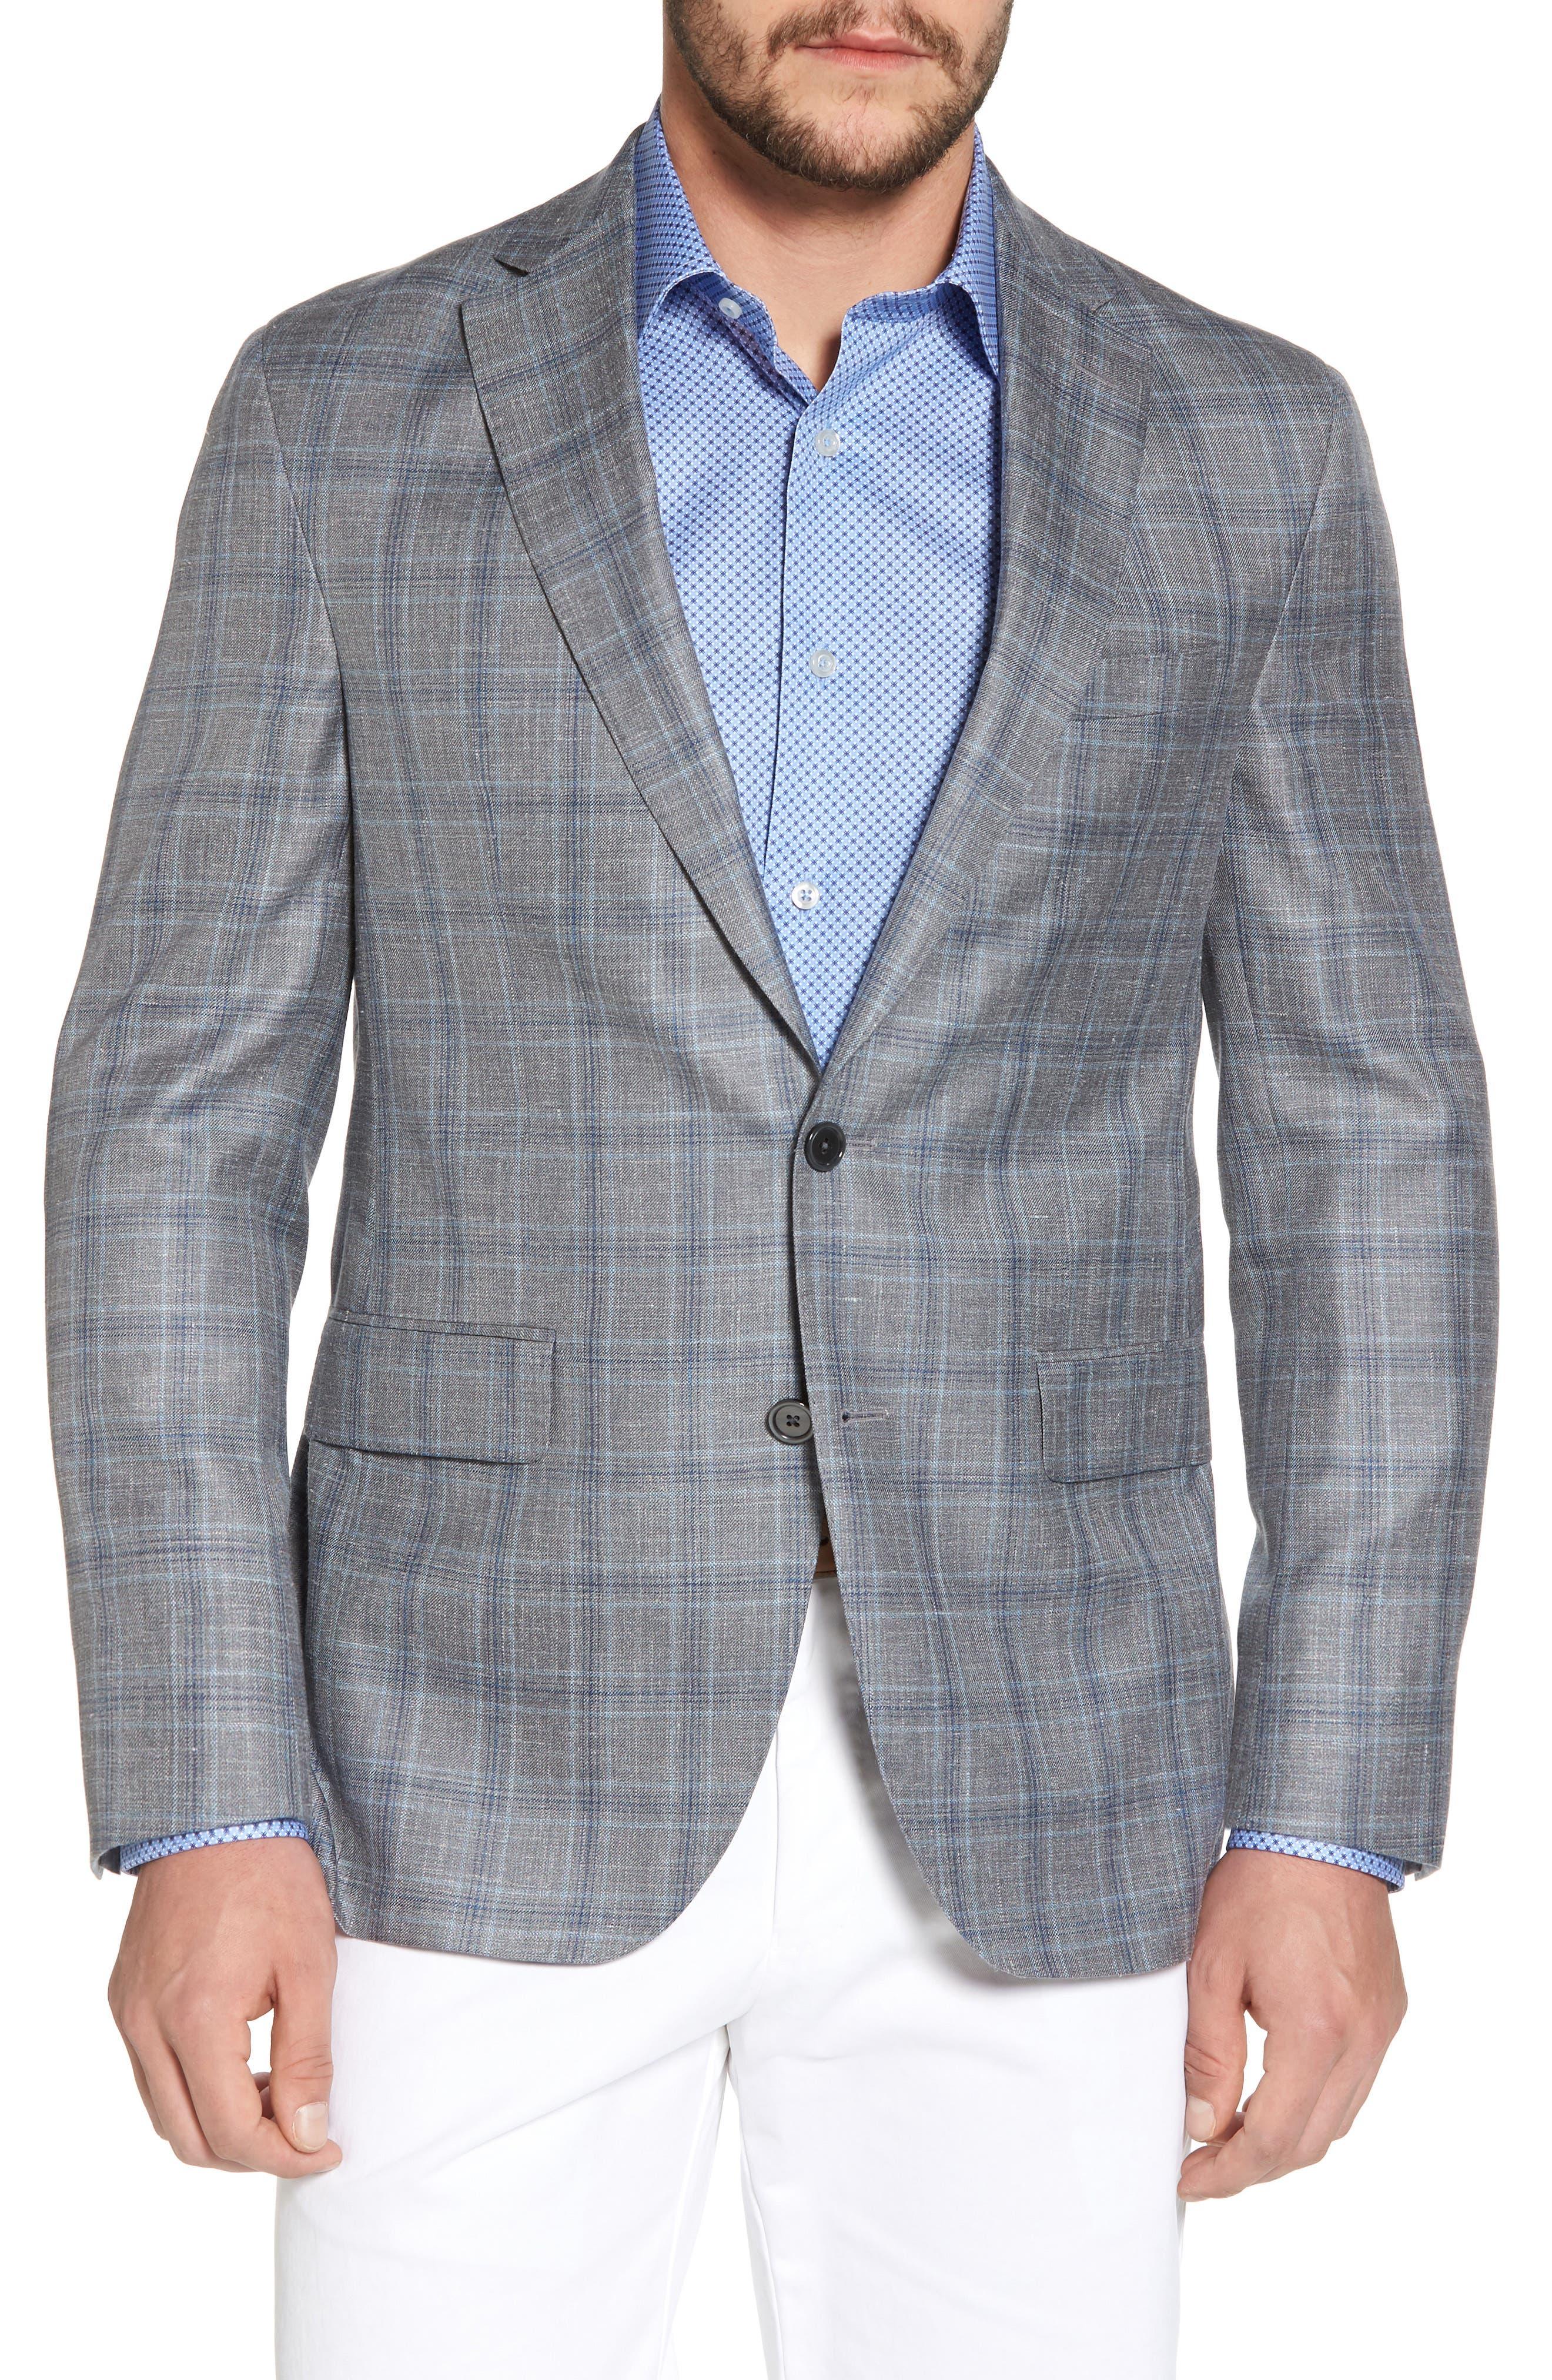 Arnold Classic Fit Plaid Wool Blend Sport Coat,                             Main thumbnail 1, color,                             020